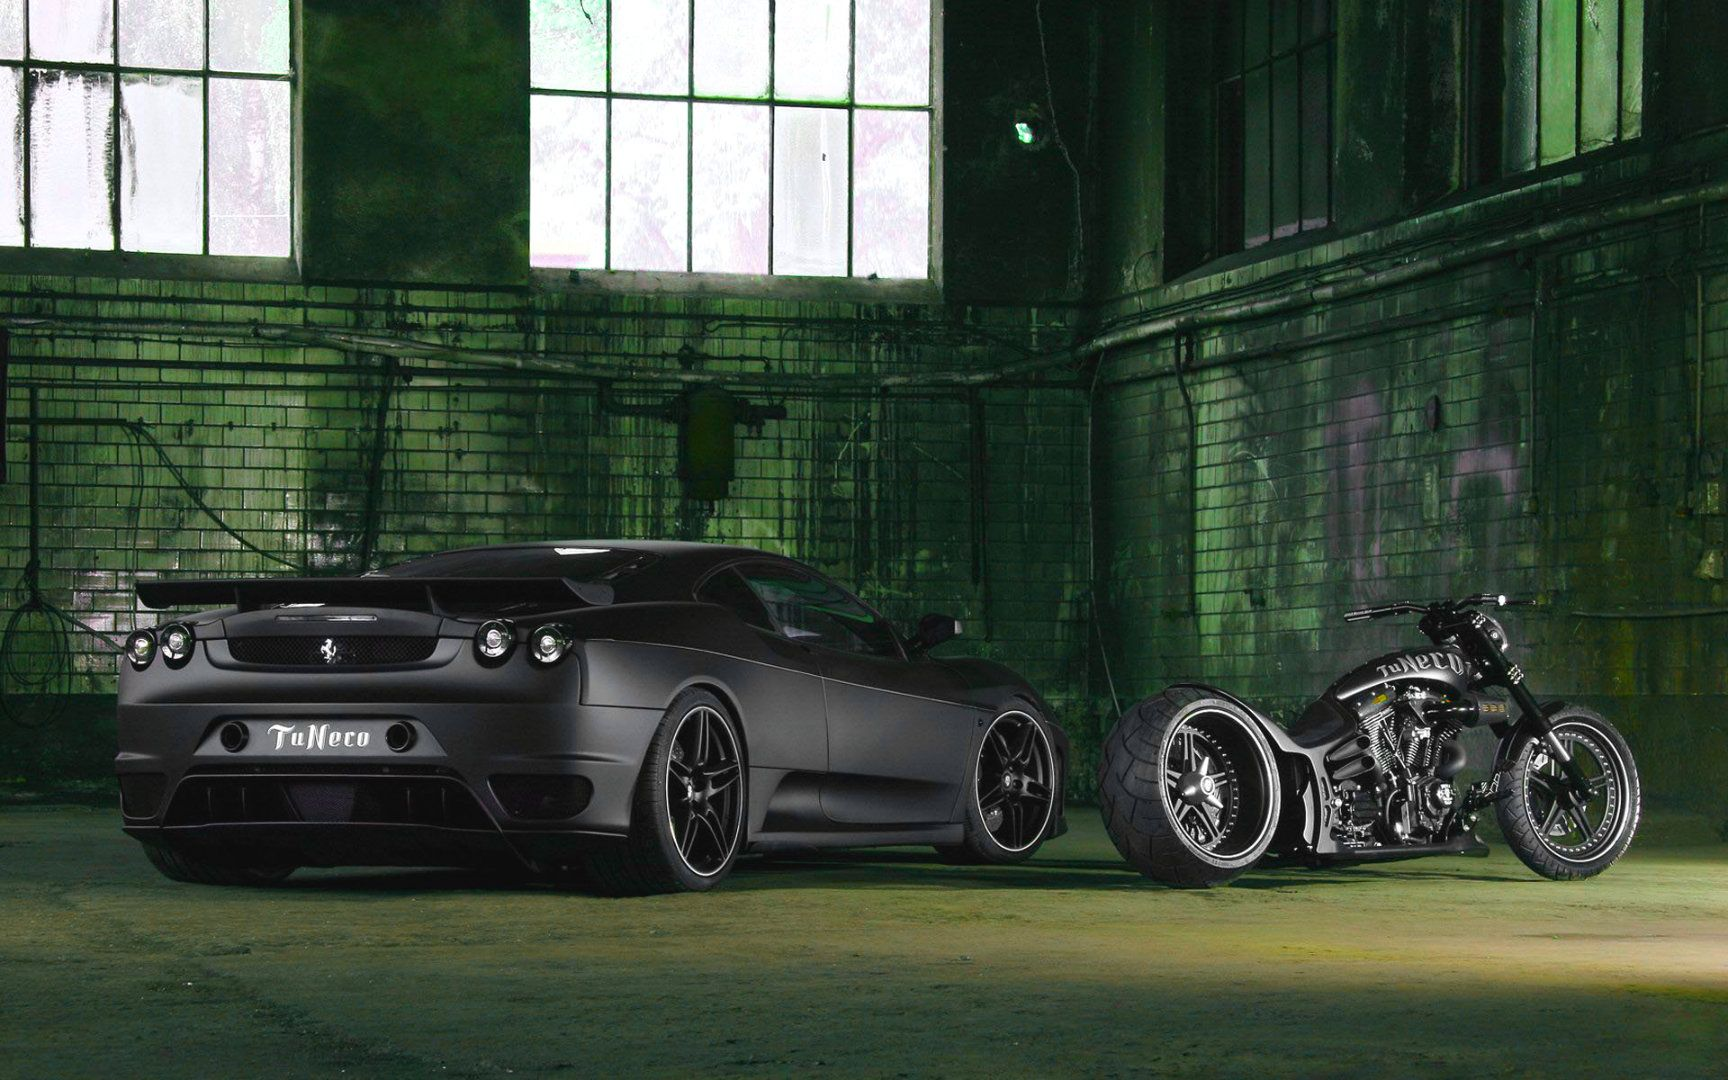 Black Ferrari Wallpapers Cars Wallpapers Hd Pinterest Cars